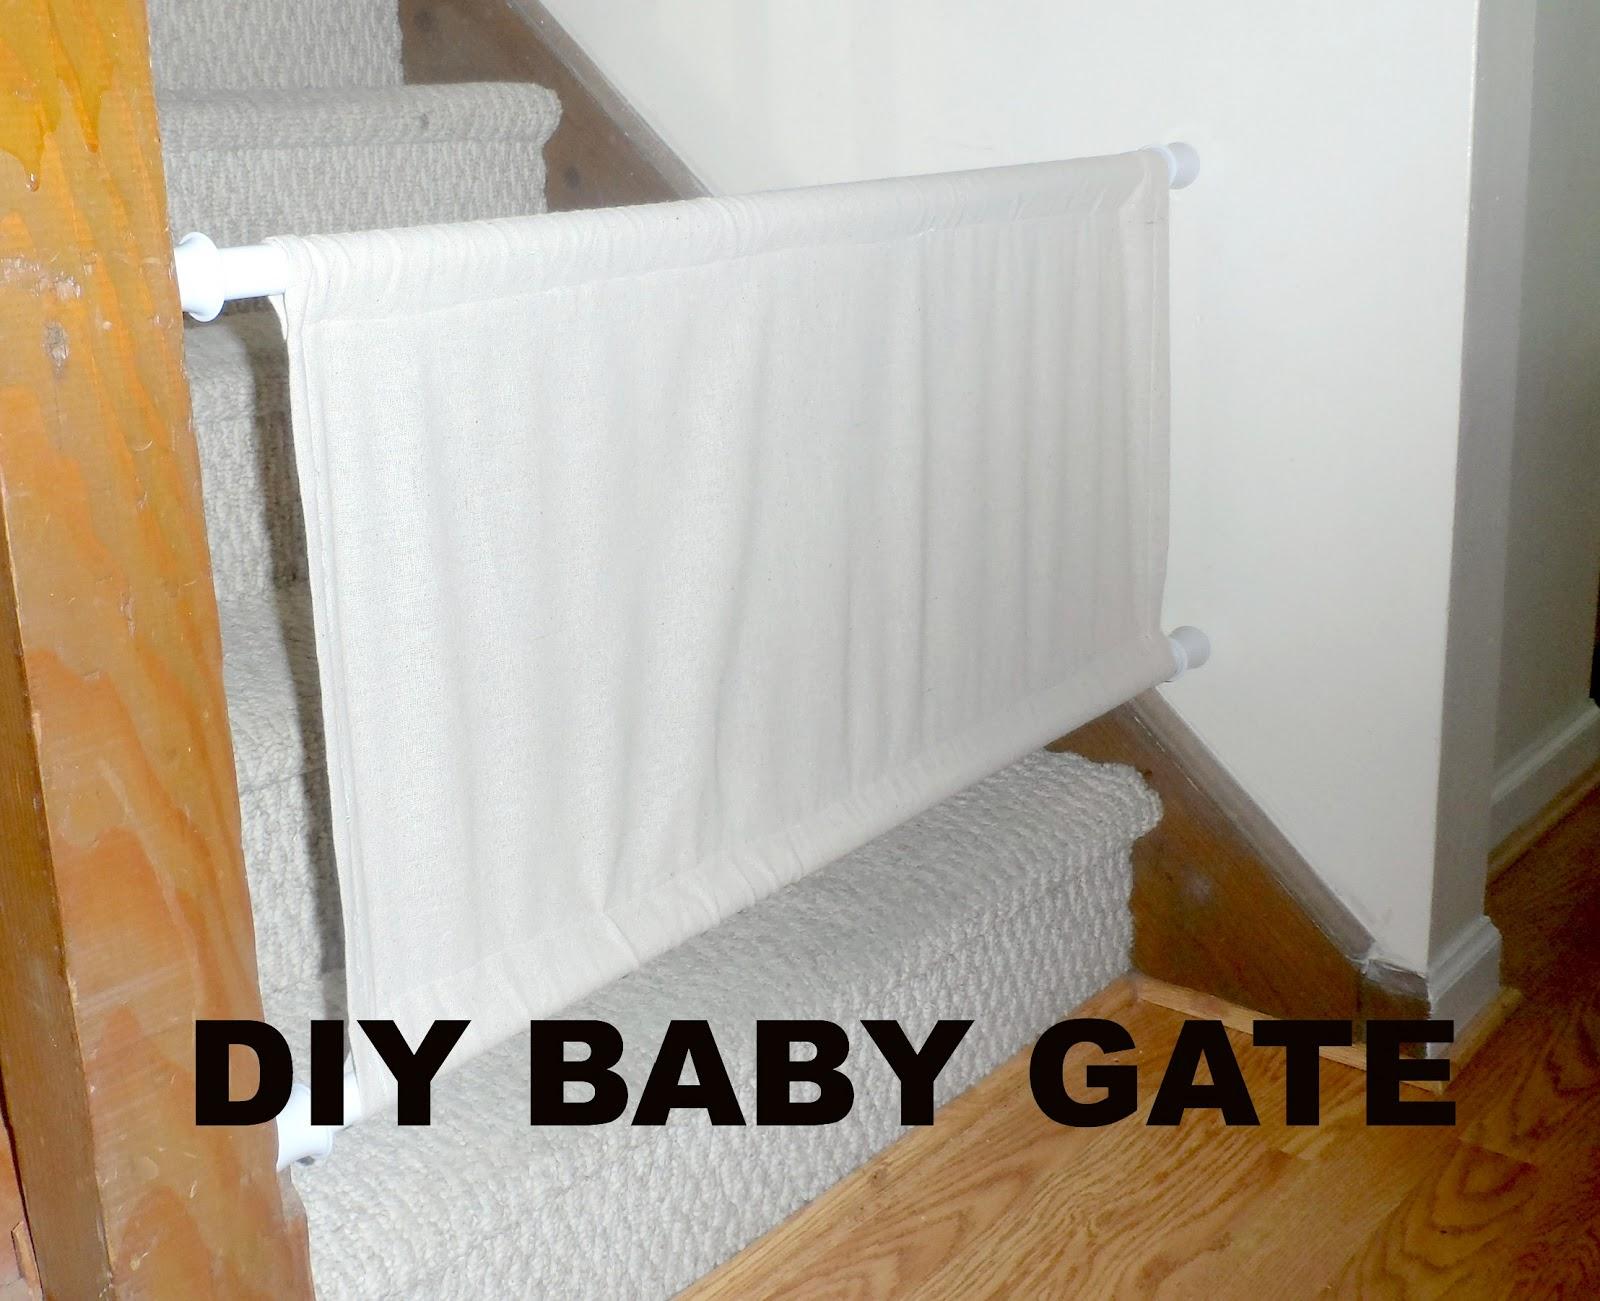 Diy Tuesday Diy Baby Gate Urban Homenomics